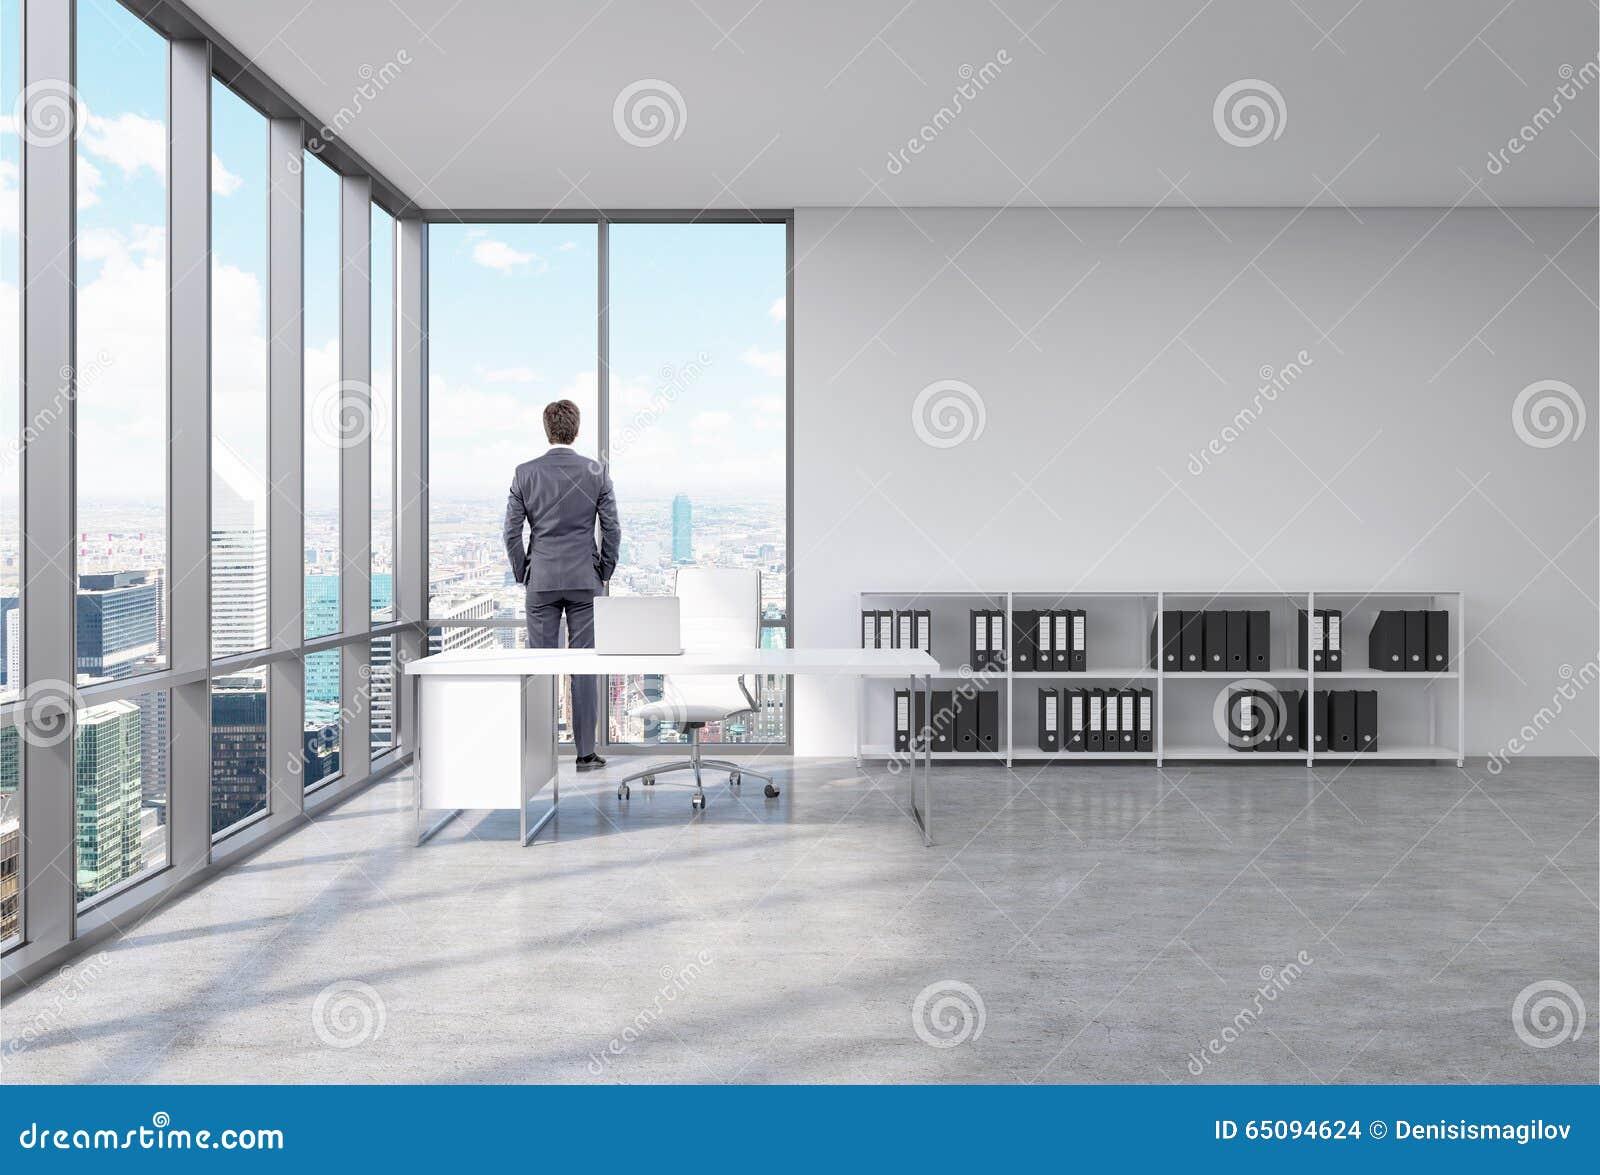 homme dans un bureau devant la fen tre illustration stock illustration du pr sidence neuf. Black Bedroom Furniture Sets. Home Design Ideas